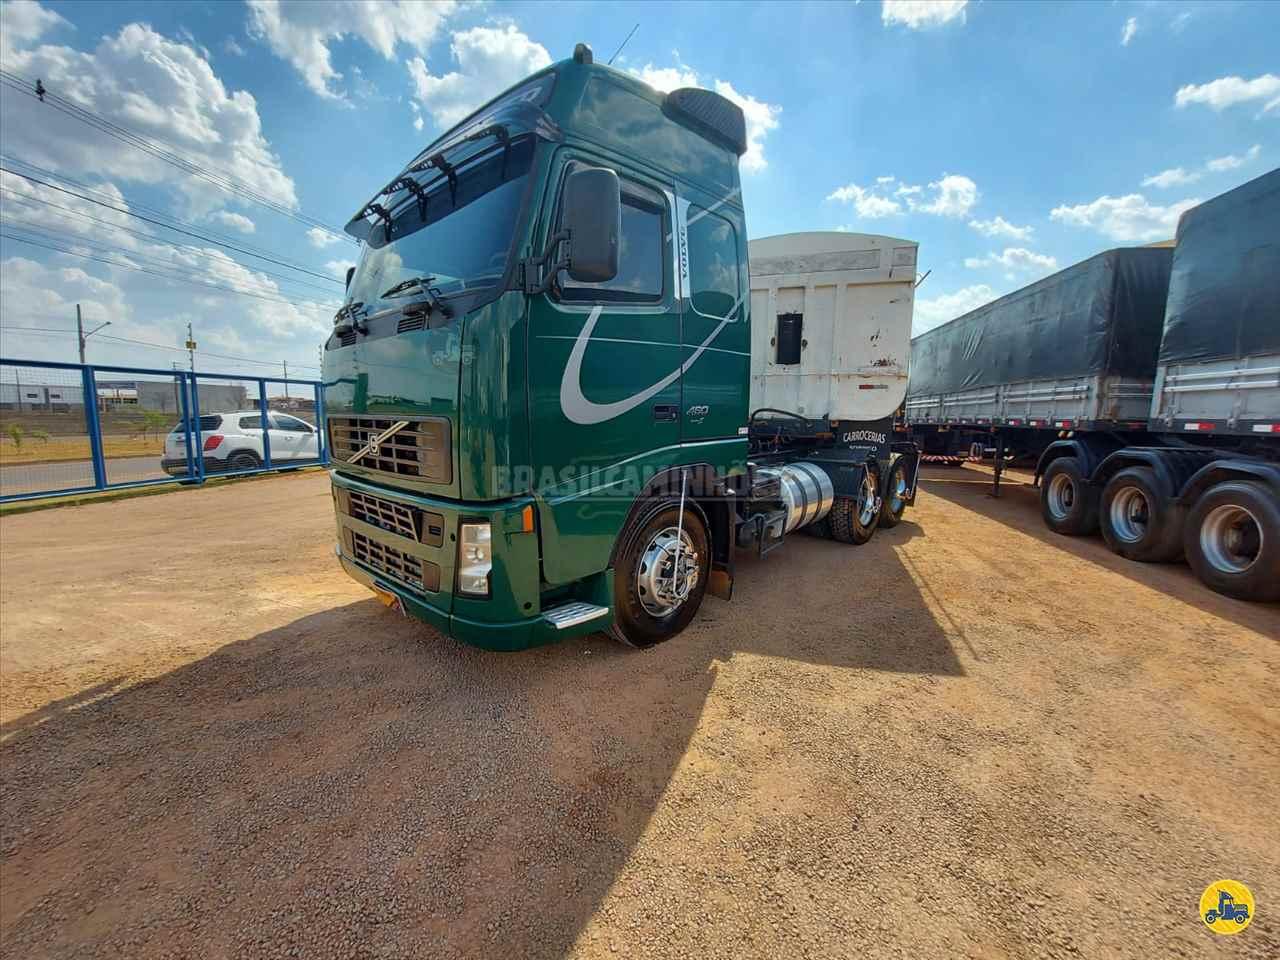 CAMINHAO VOLVO VOLVO FH 460 Caçamba Basculante Truck 6x2 Brasil Caminhões Sinop SINOP MATO GROSSO MT